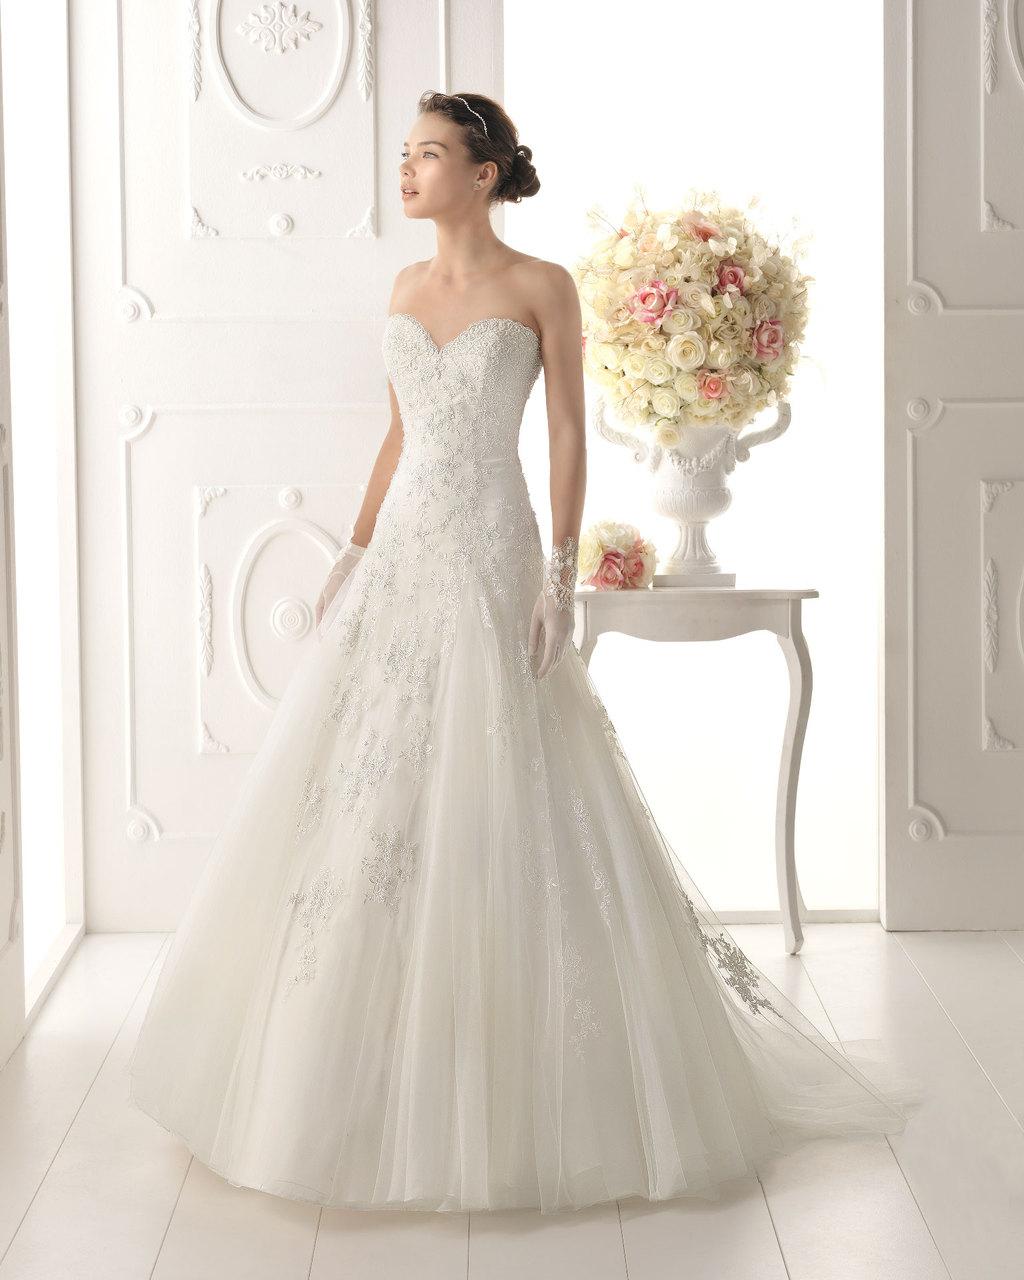 Aire-barcelona-wedding-dress-2014-bridal-ofelia.full